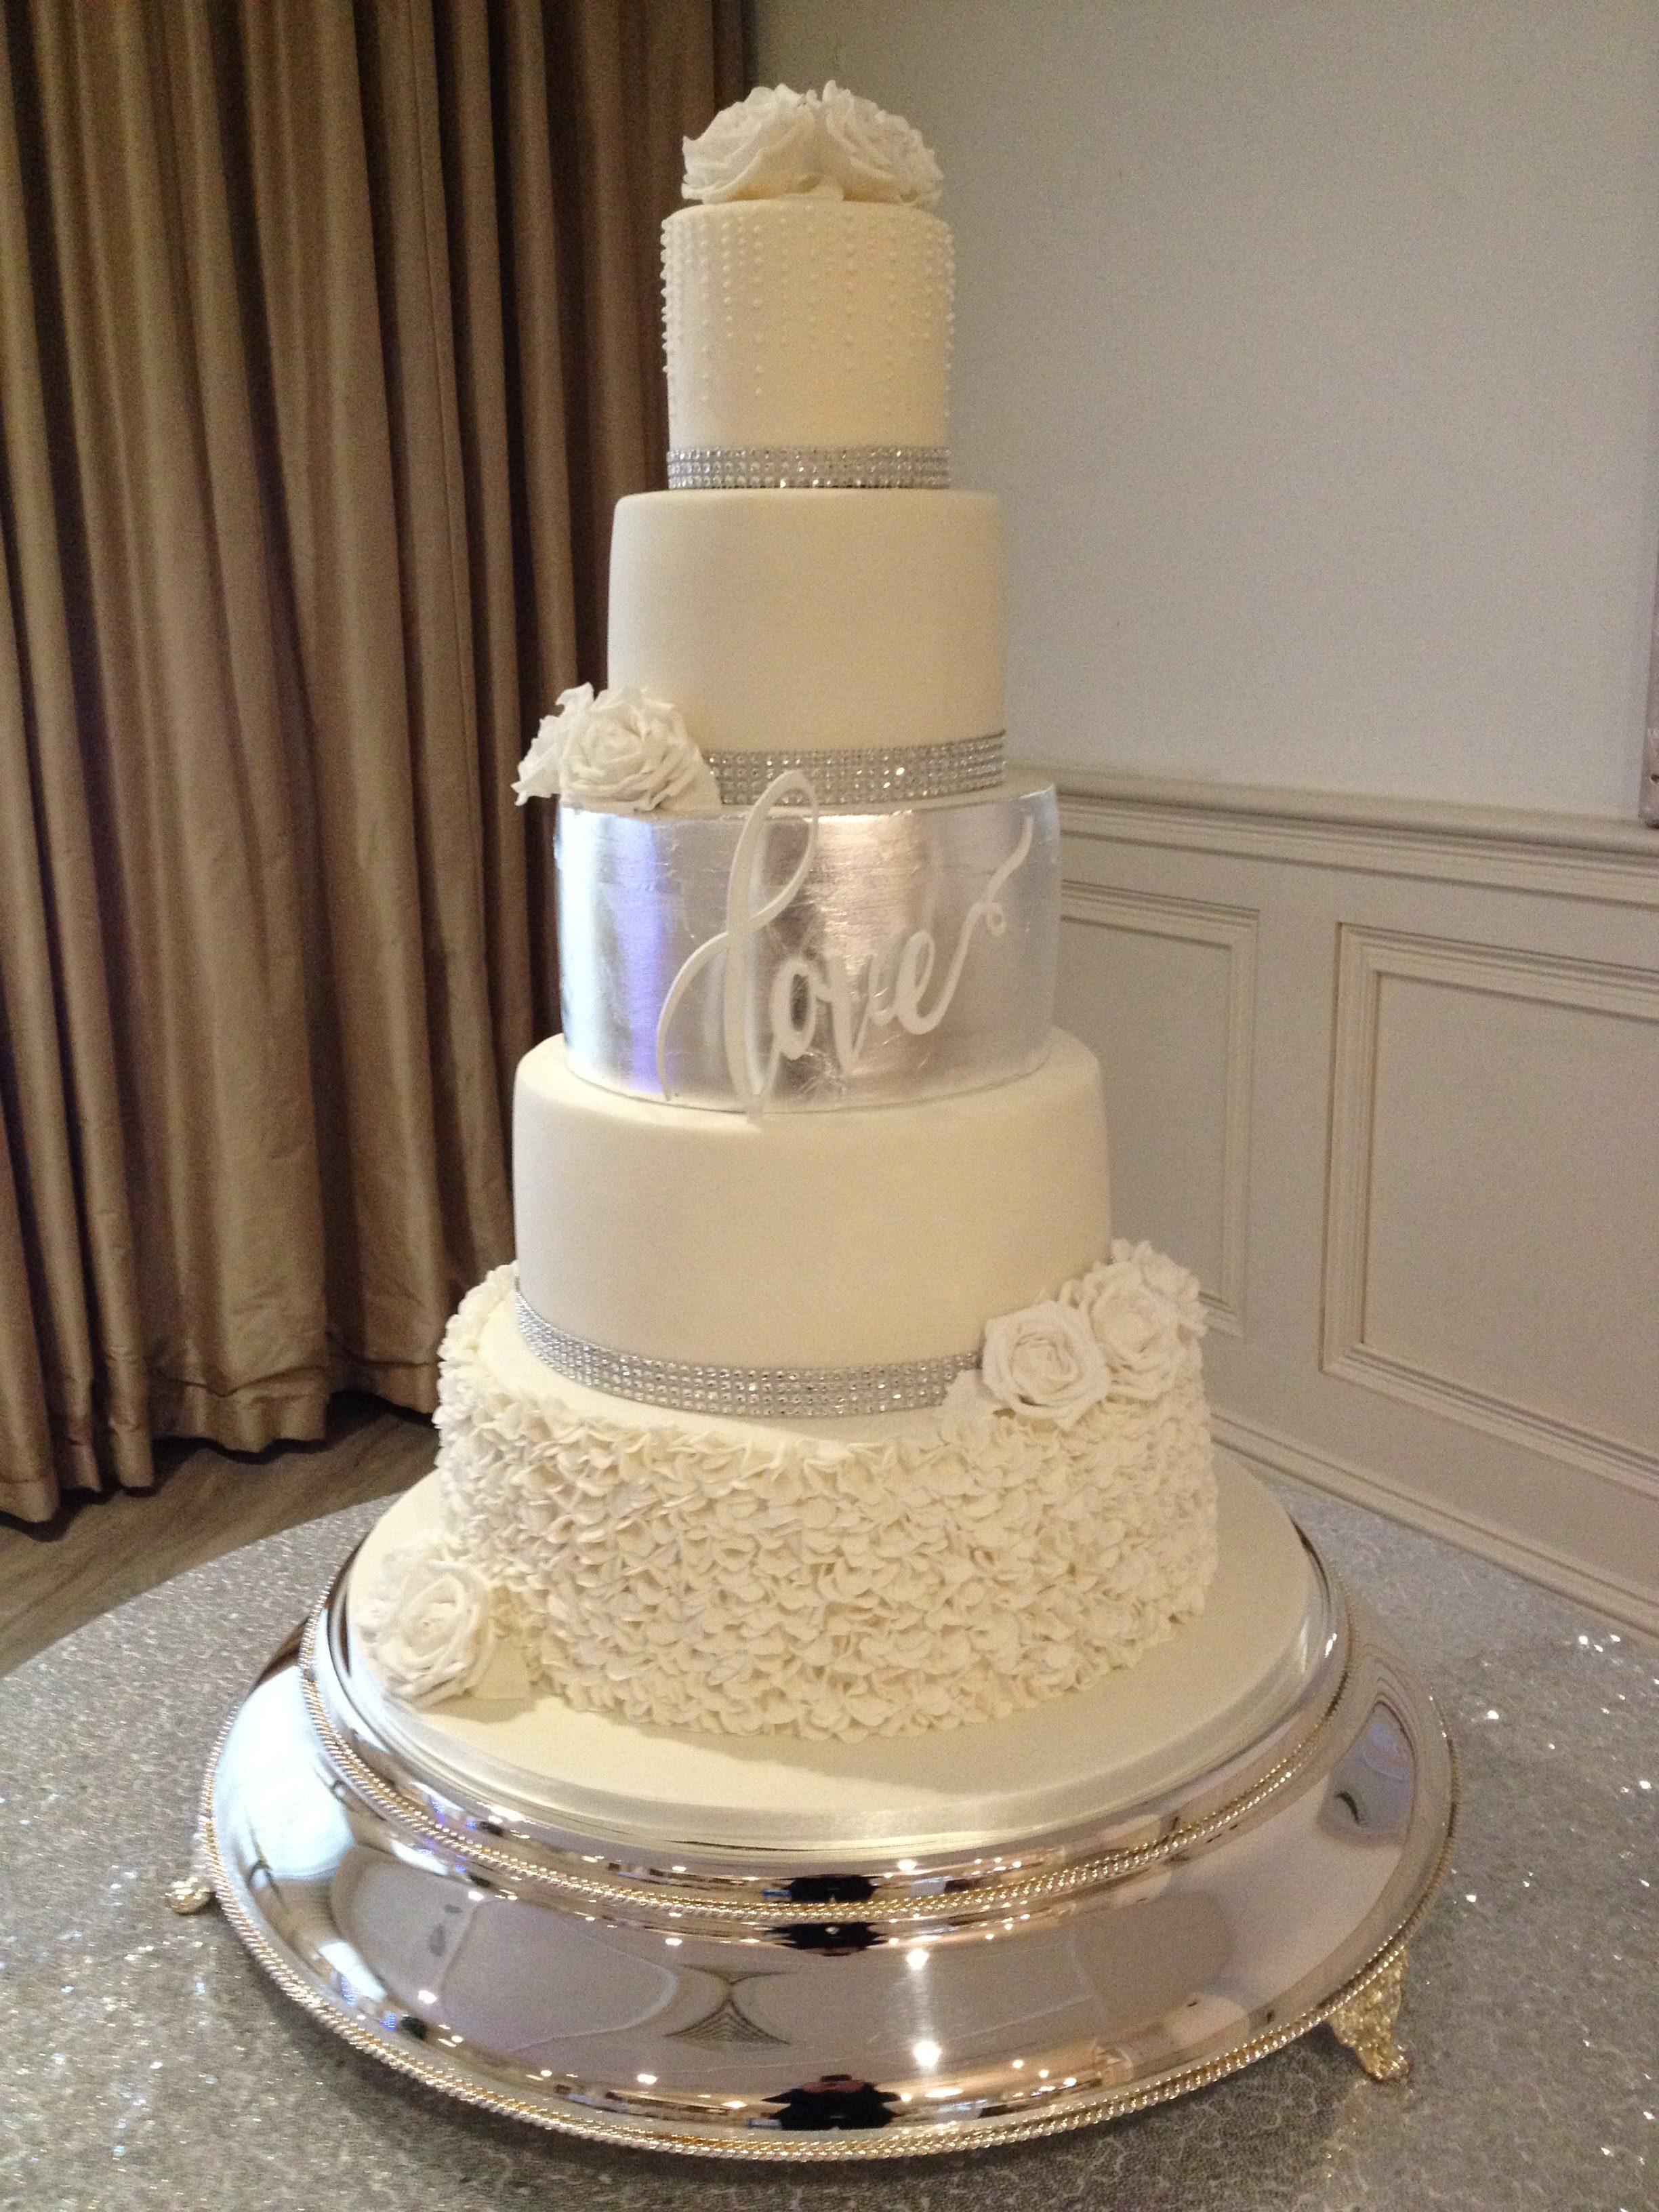 Love Wedding Cake 3